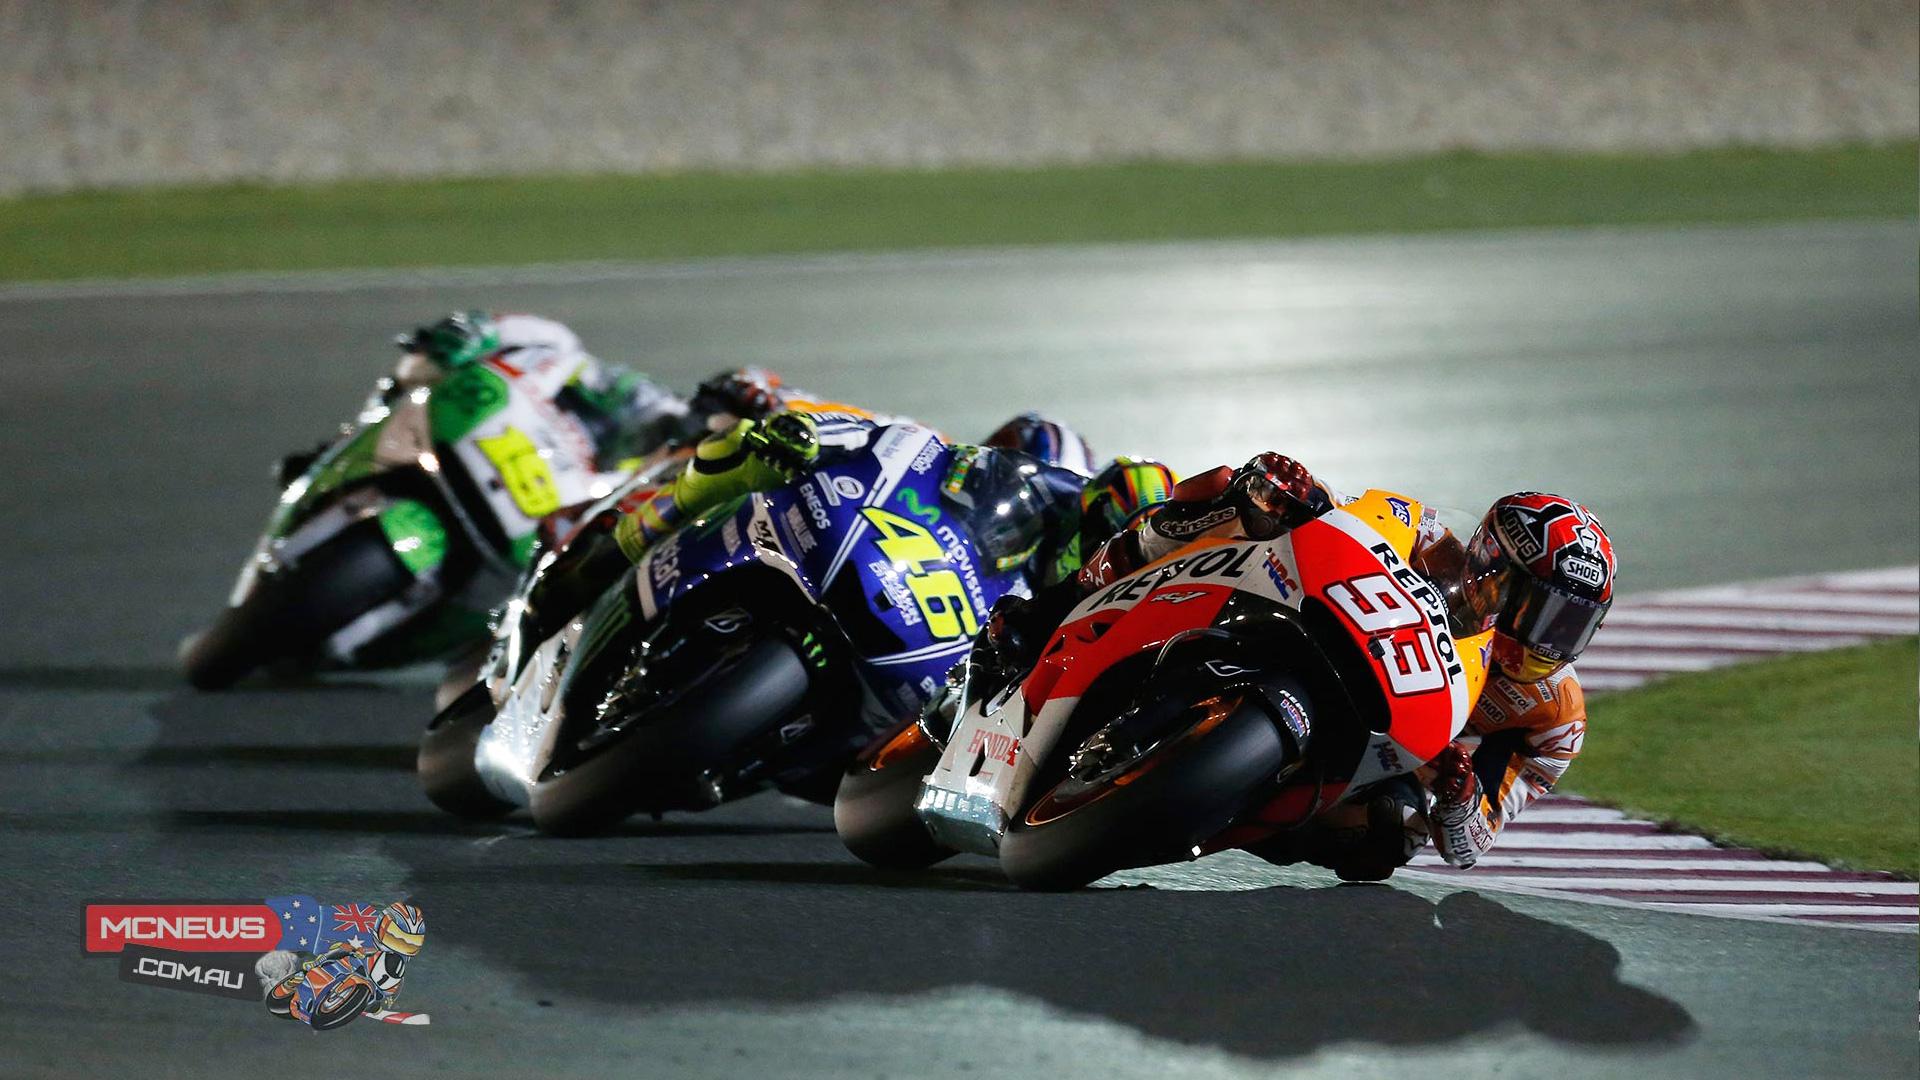 motogp 2014 wallpaper hd MotoGP 2014 Wallpaper HD 1920x1080